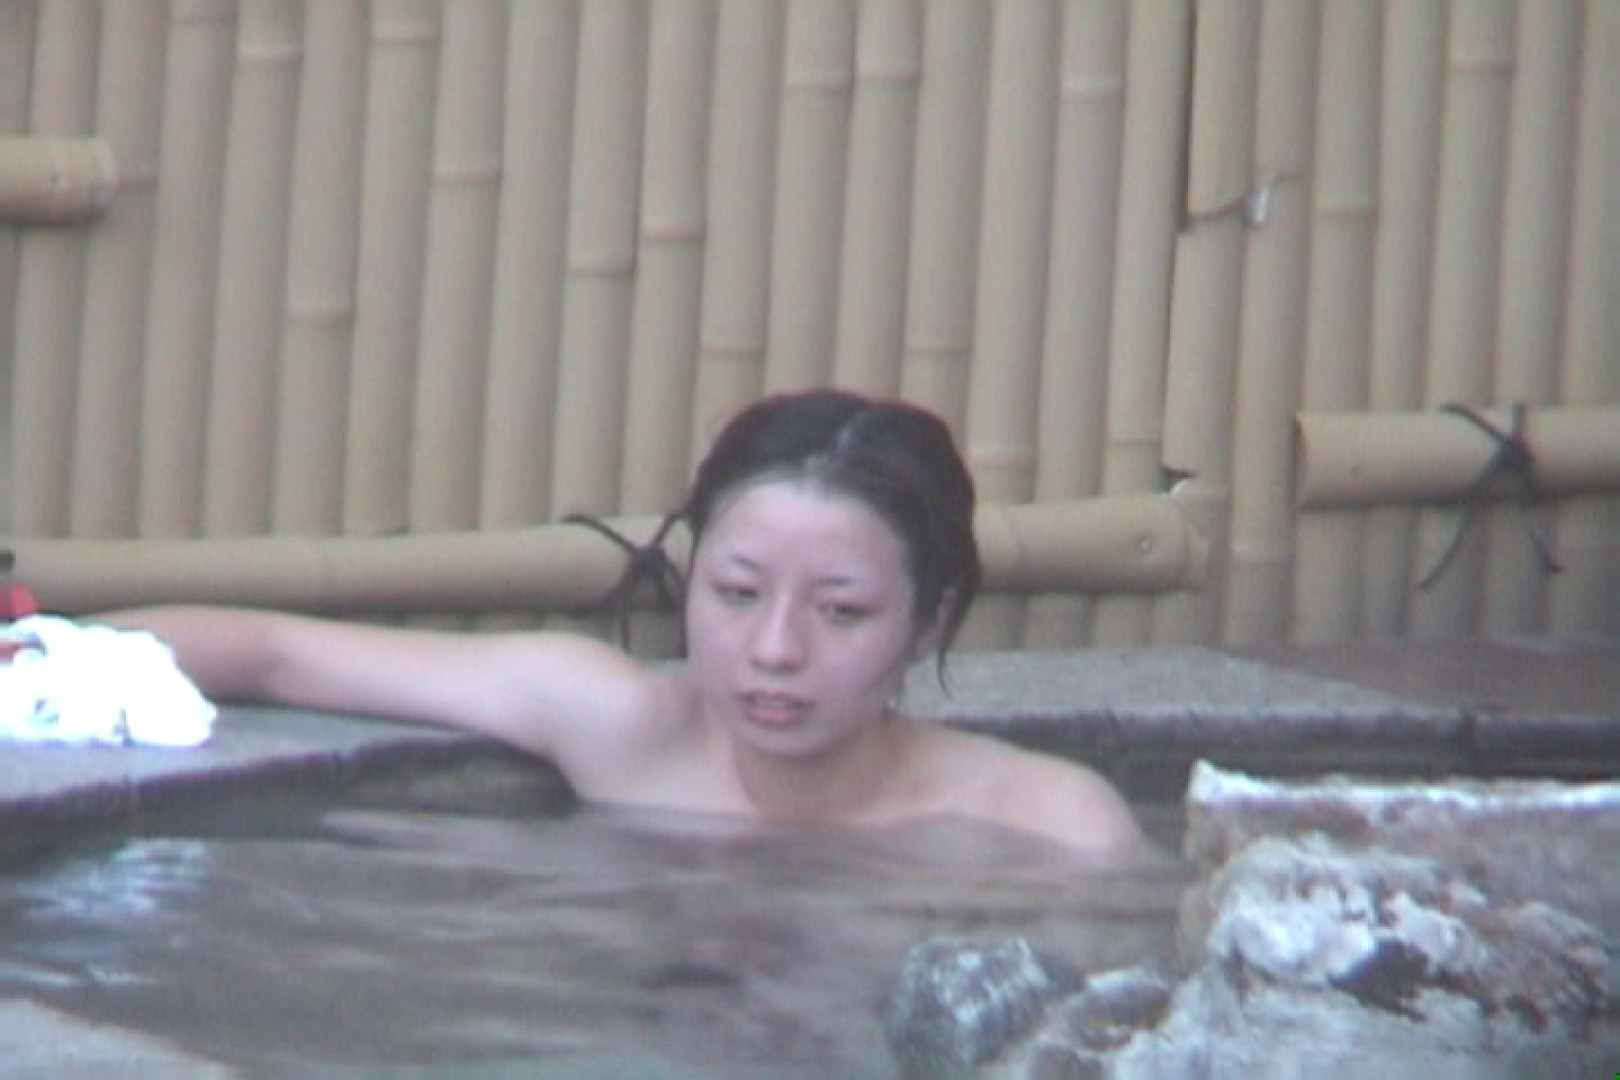 Aquaな露天風呂Vol.608 美しいOLの裸体 AV動画キャプチャ 95pic 59